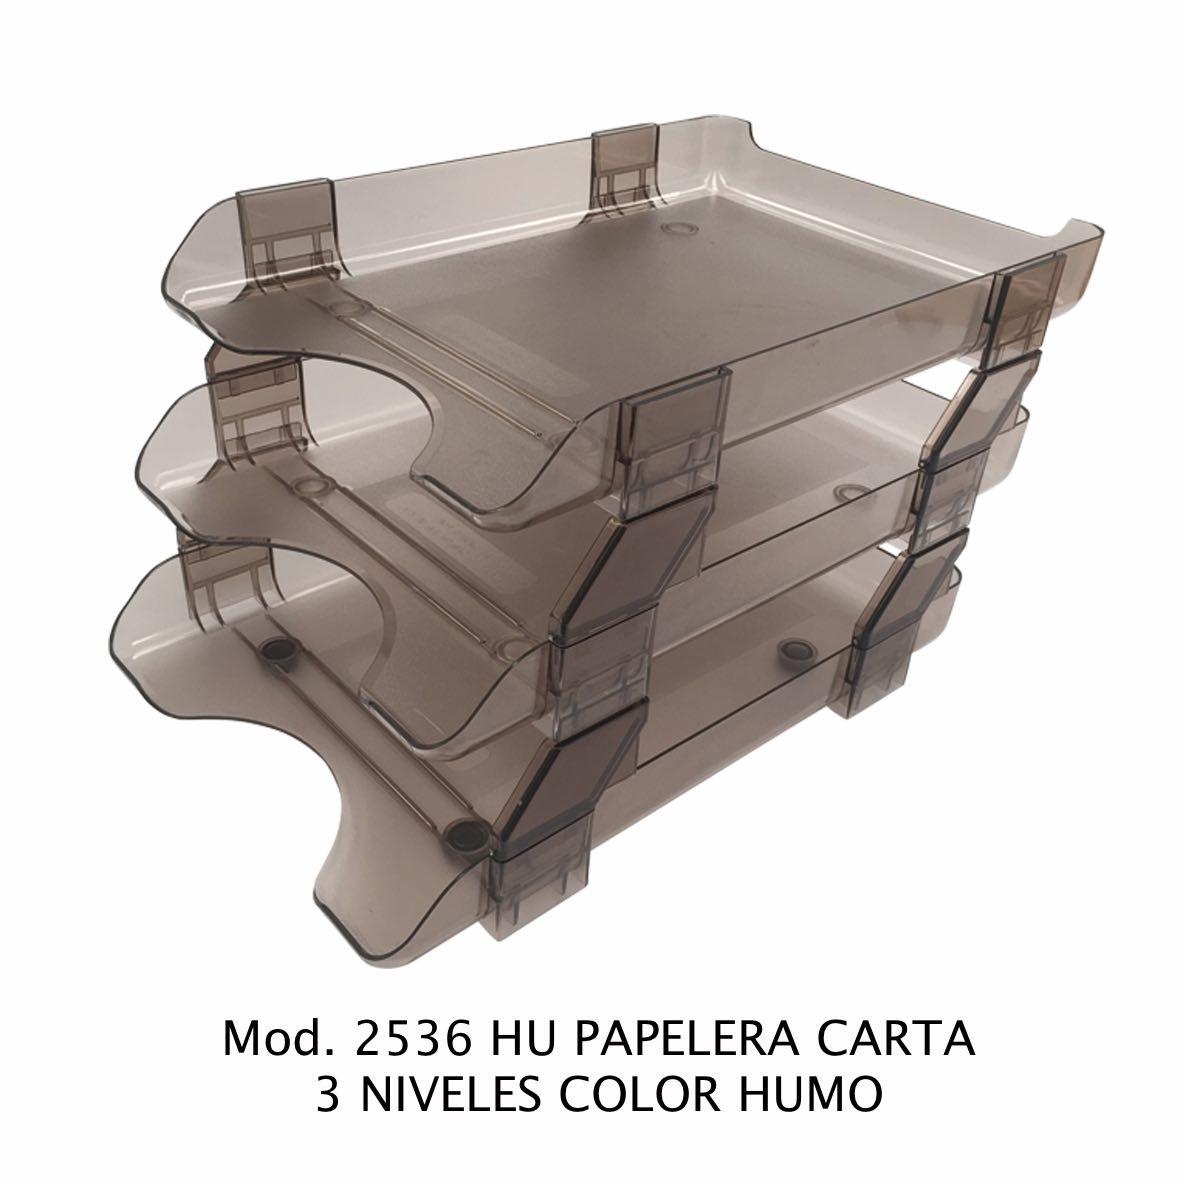 Charola papelera color humo tamaño carta de 3 niveles Modelo 2536 HU - Sablón